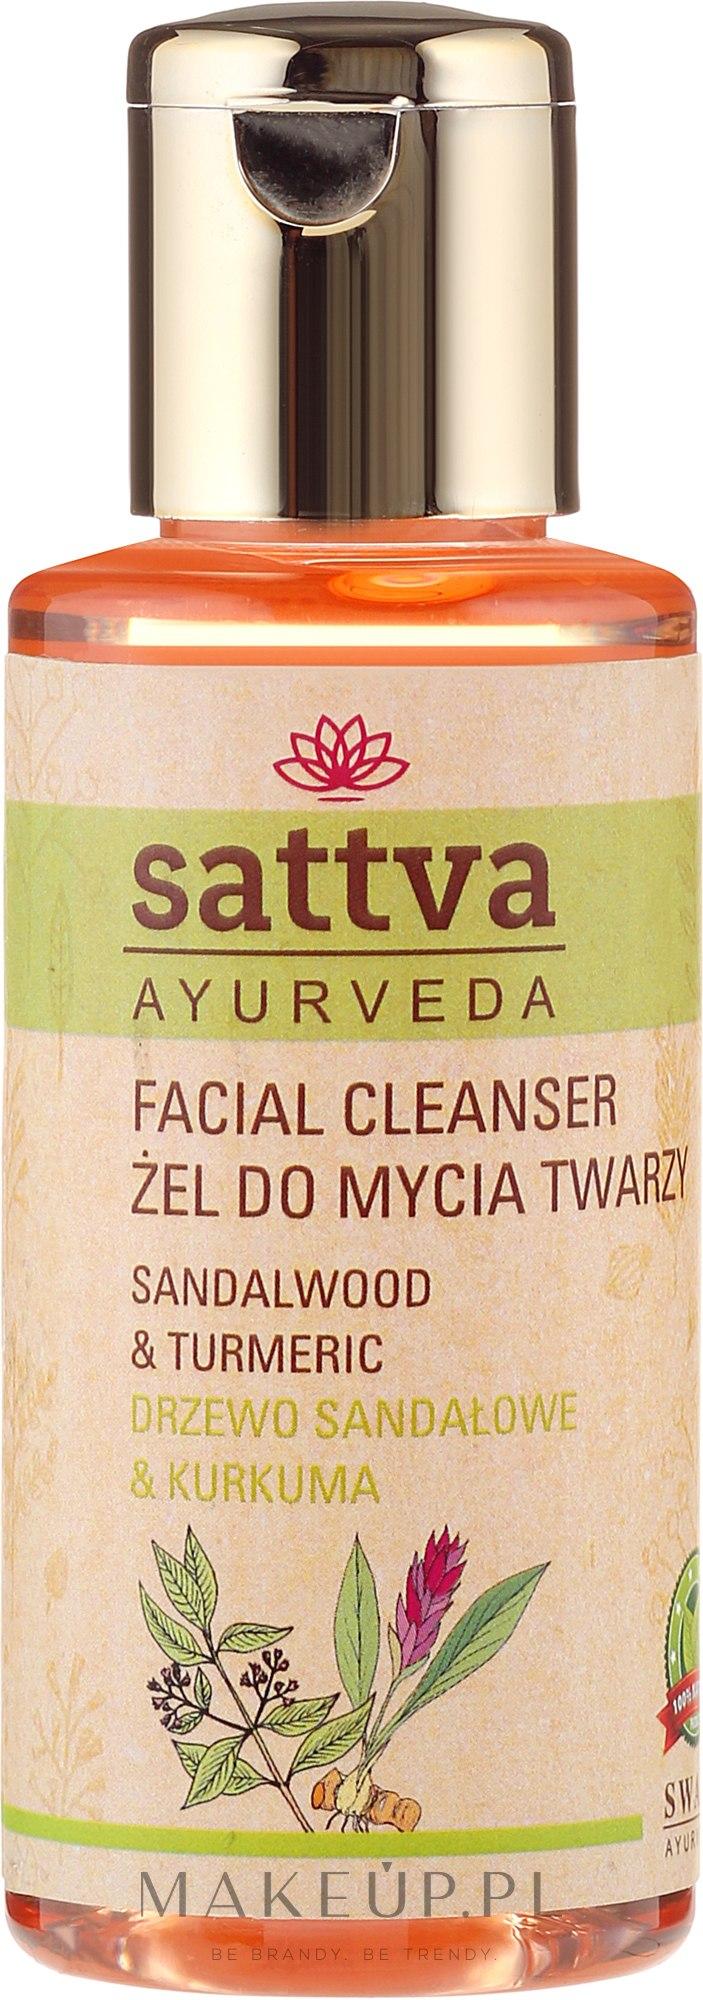 Żel do mycia twarzy Drzewo sandałowe i kurkuma - Sattva Facial Cleanser Sandalwood — фото 100 ml